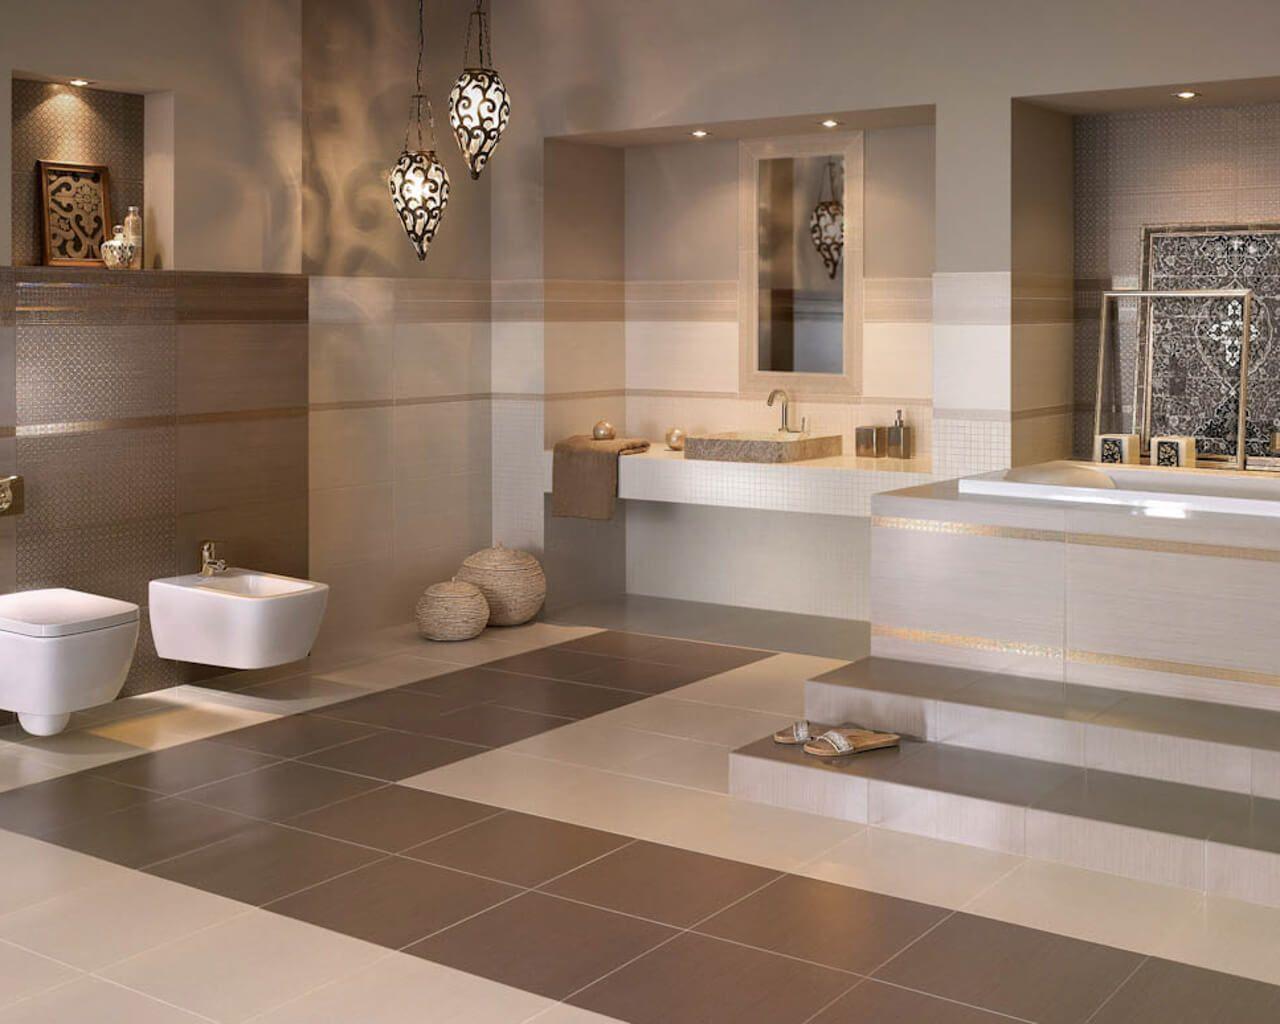 meisha garam beige bathroom tiles with tiny geometric. Black Bedroom Furniture Sets. Home Design Ideas